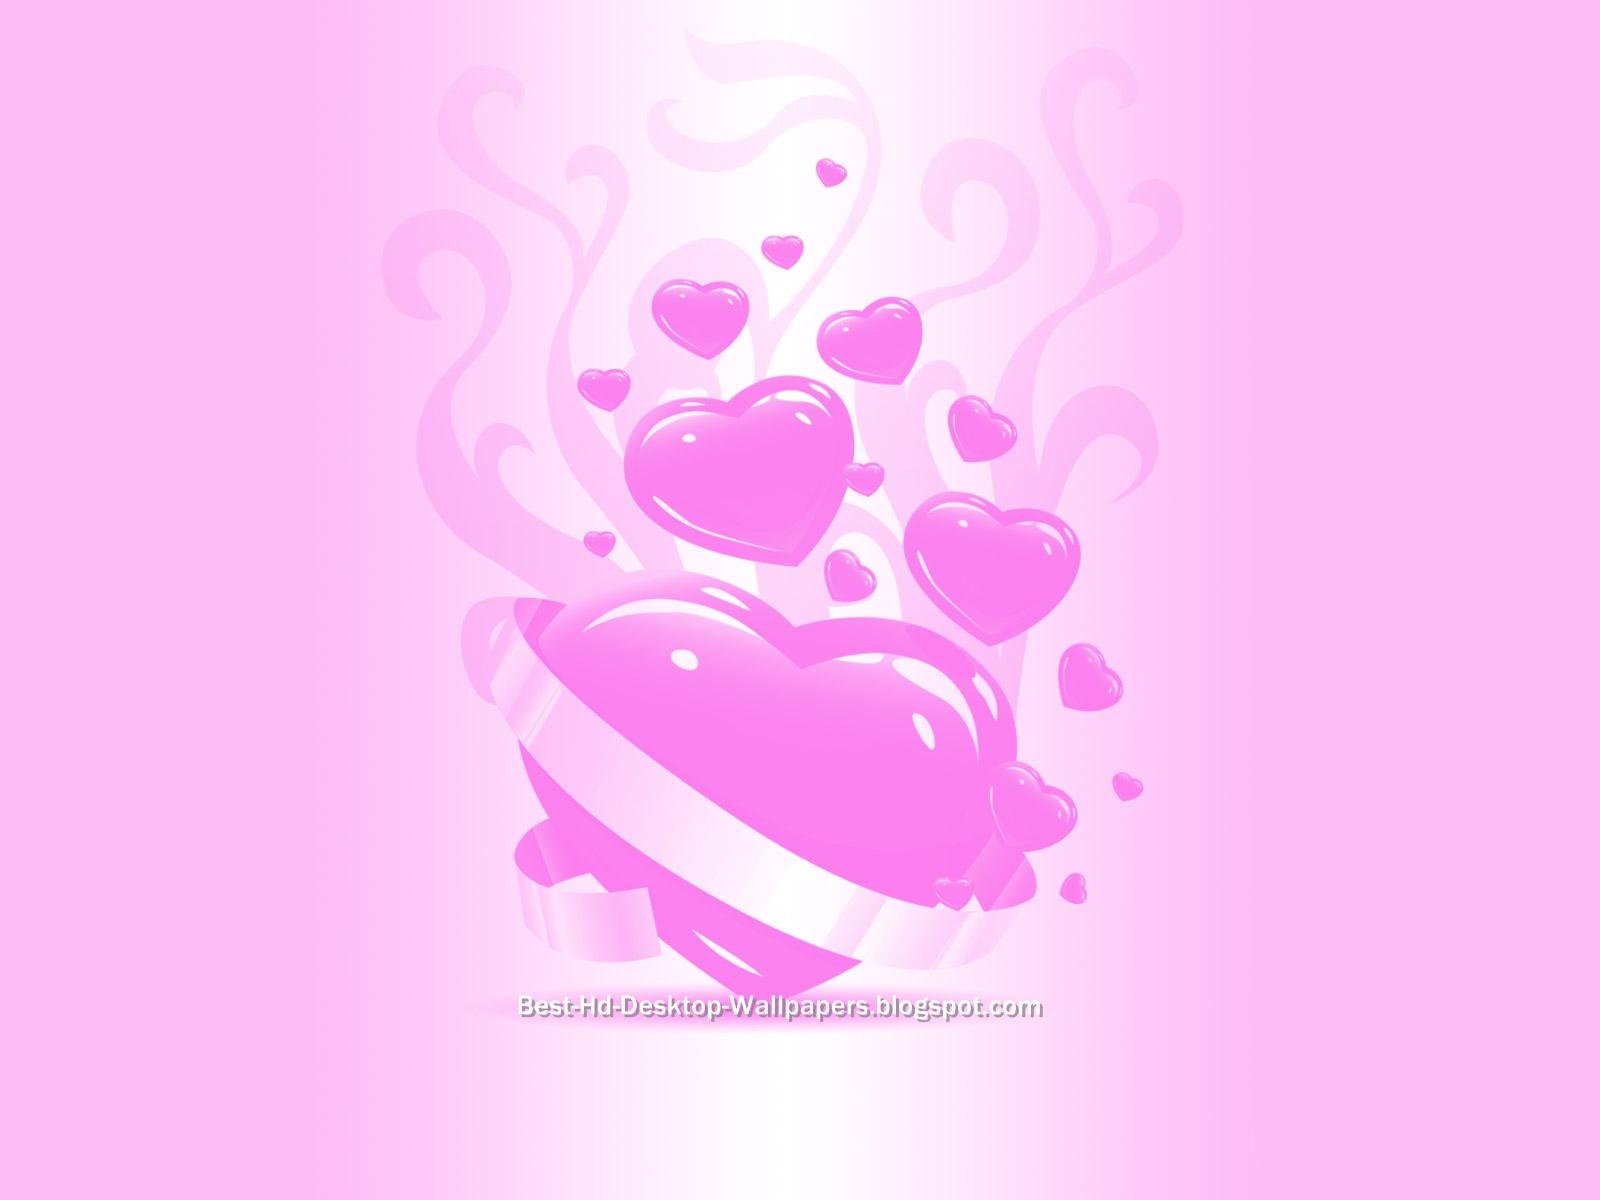 pink desktop wallpapers hd quality best hd desktop